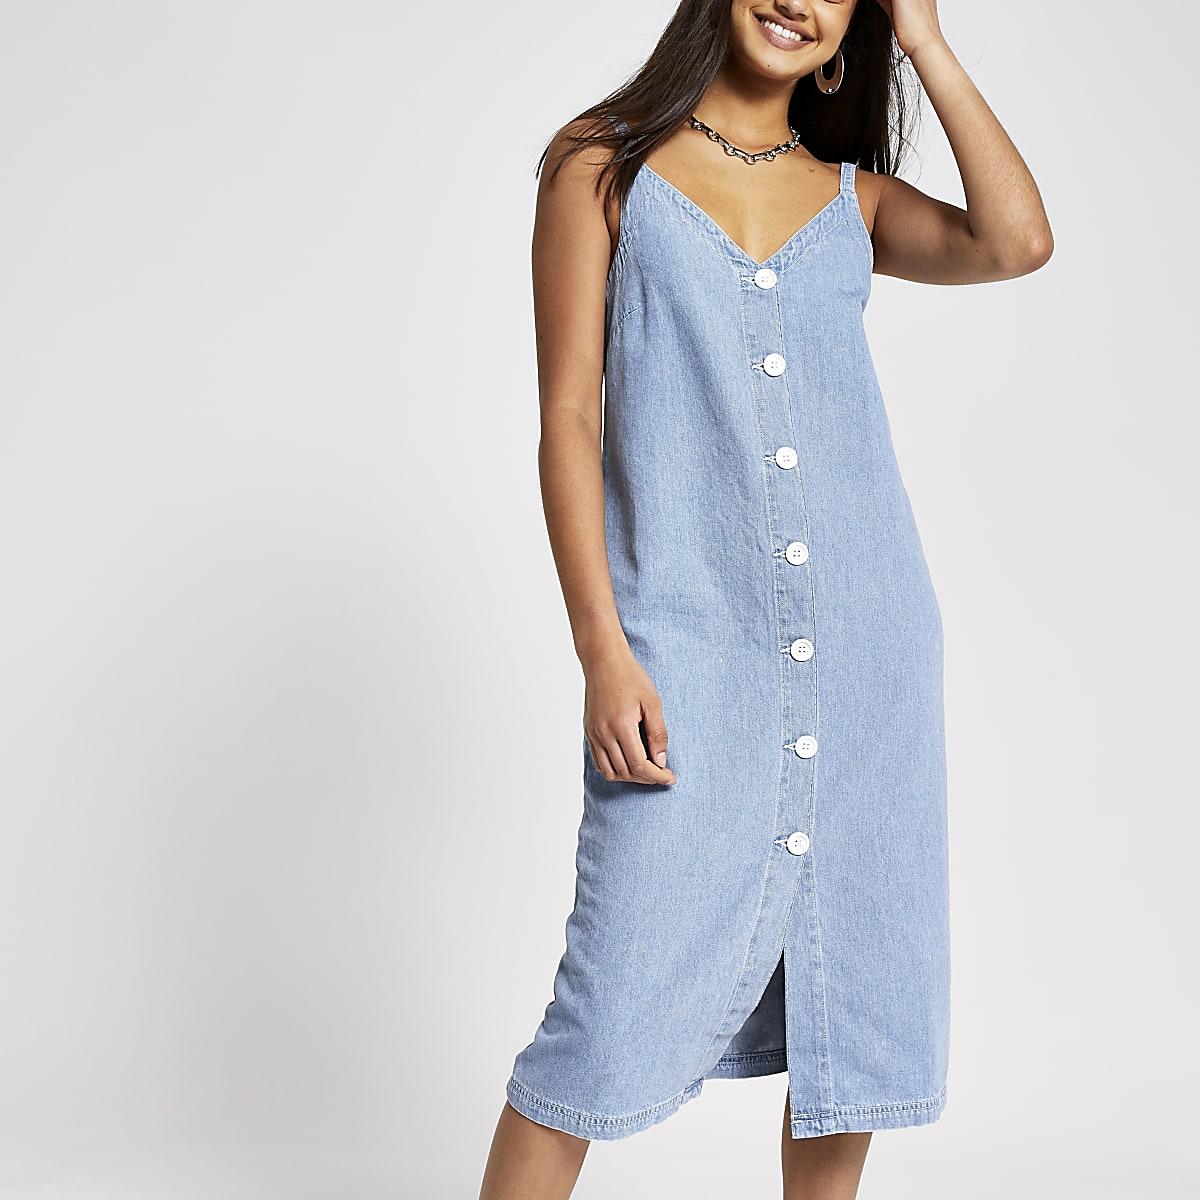 Robe longue en denim bleu clair